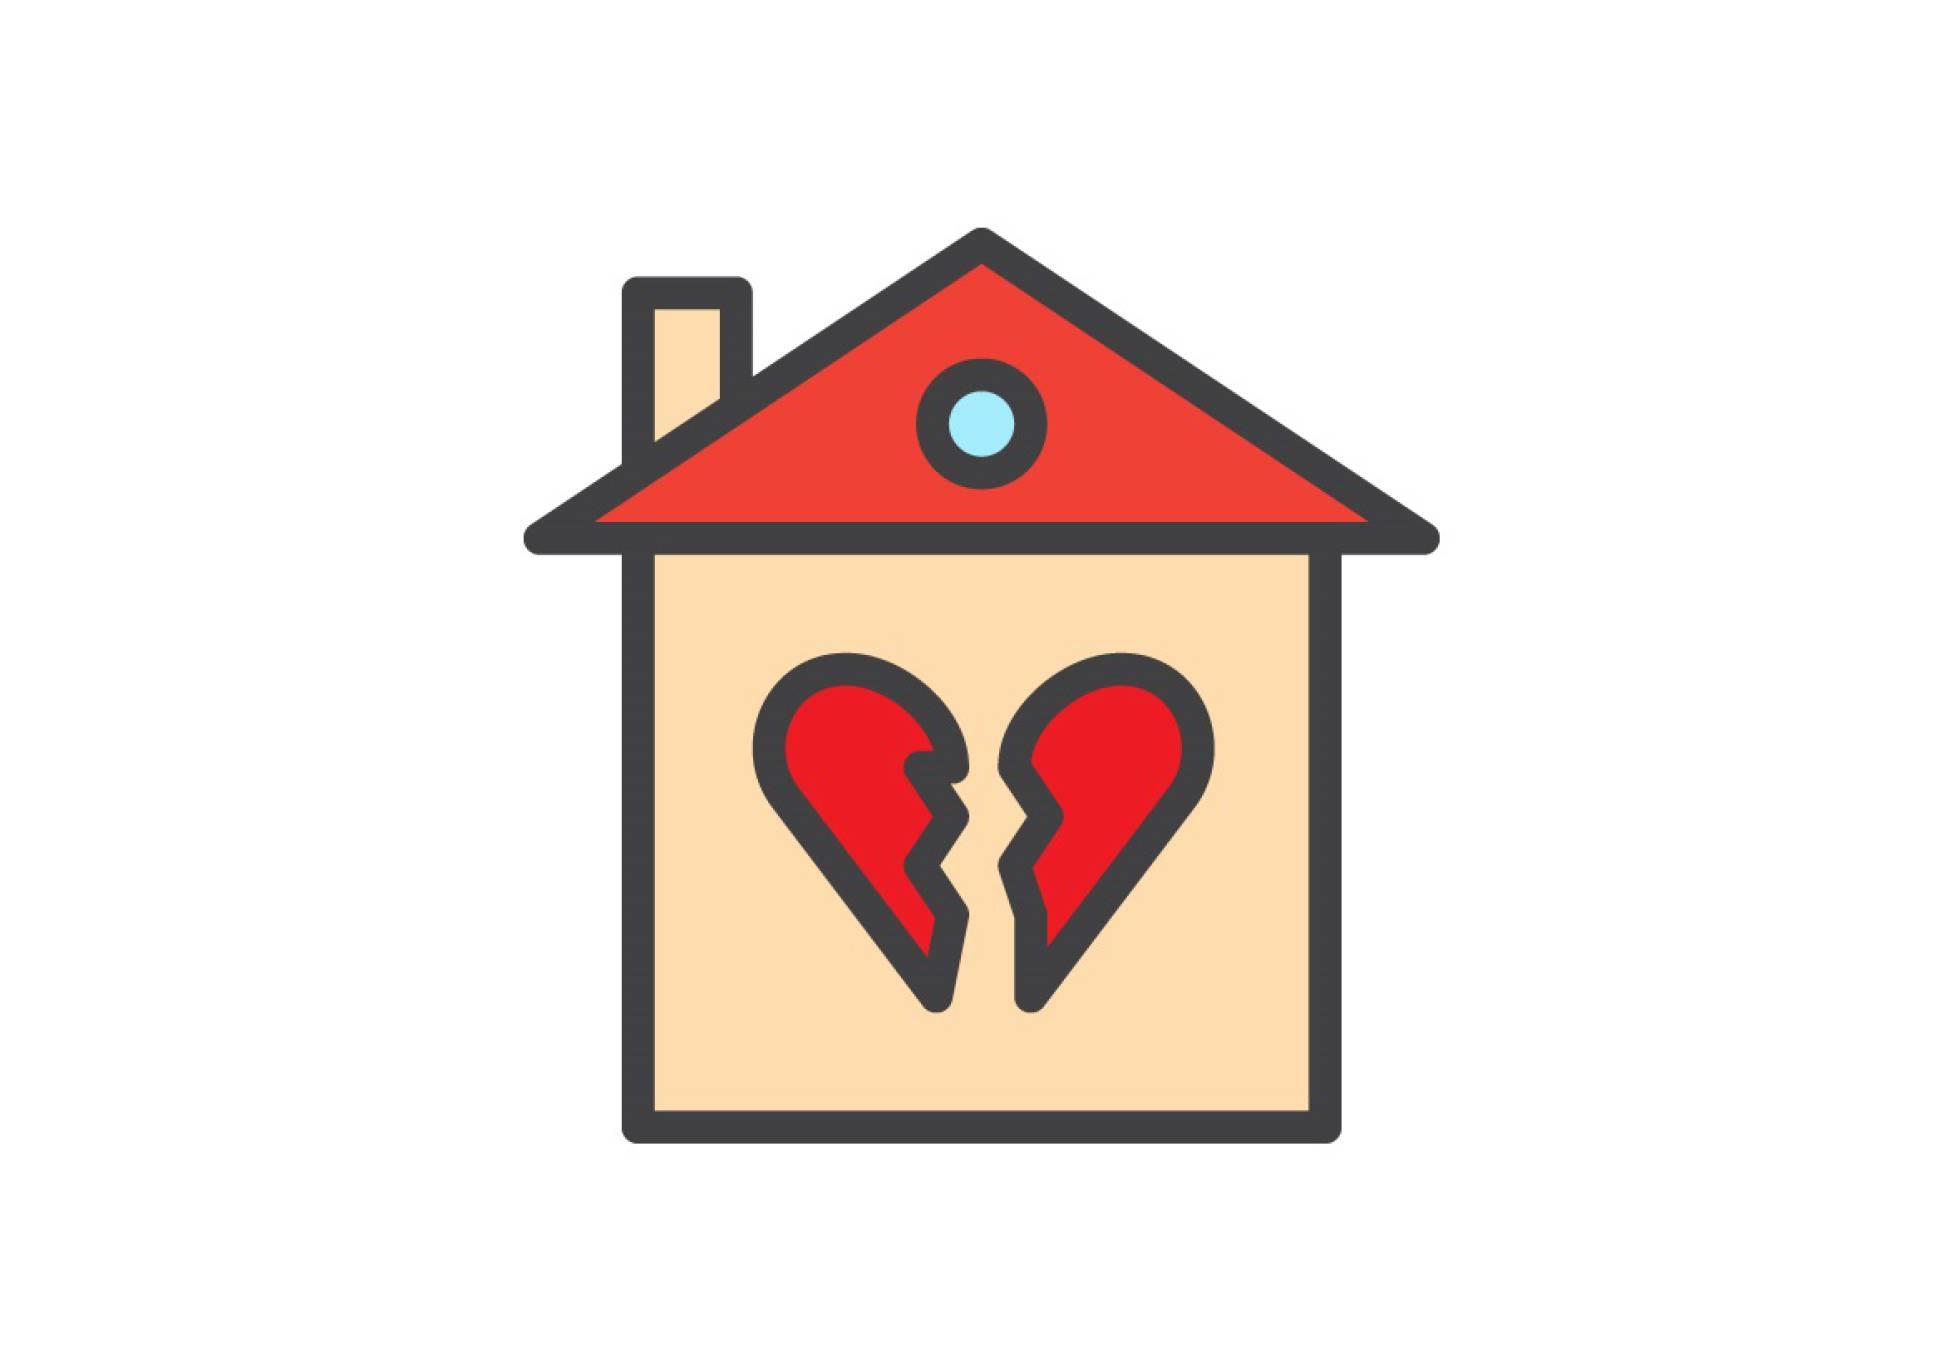 Hipotecarse con tu pareja te puede salir muy caro